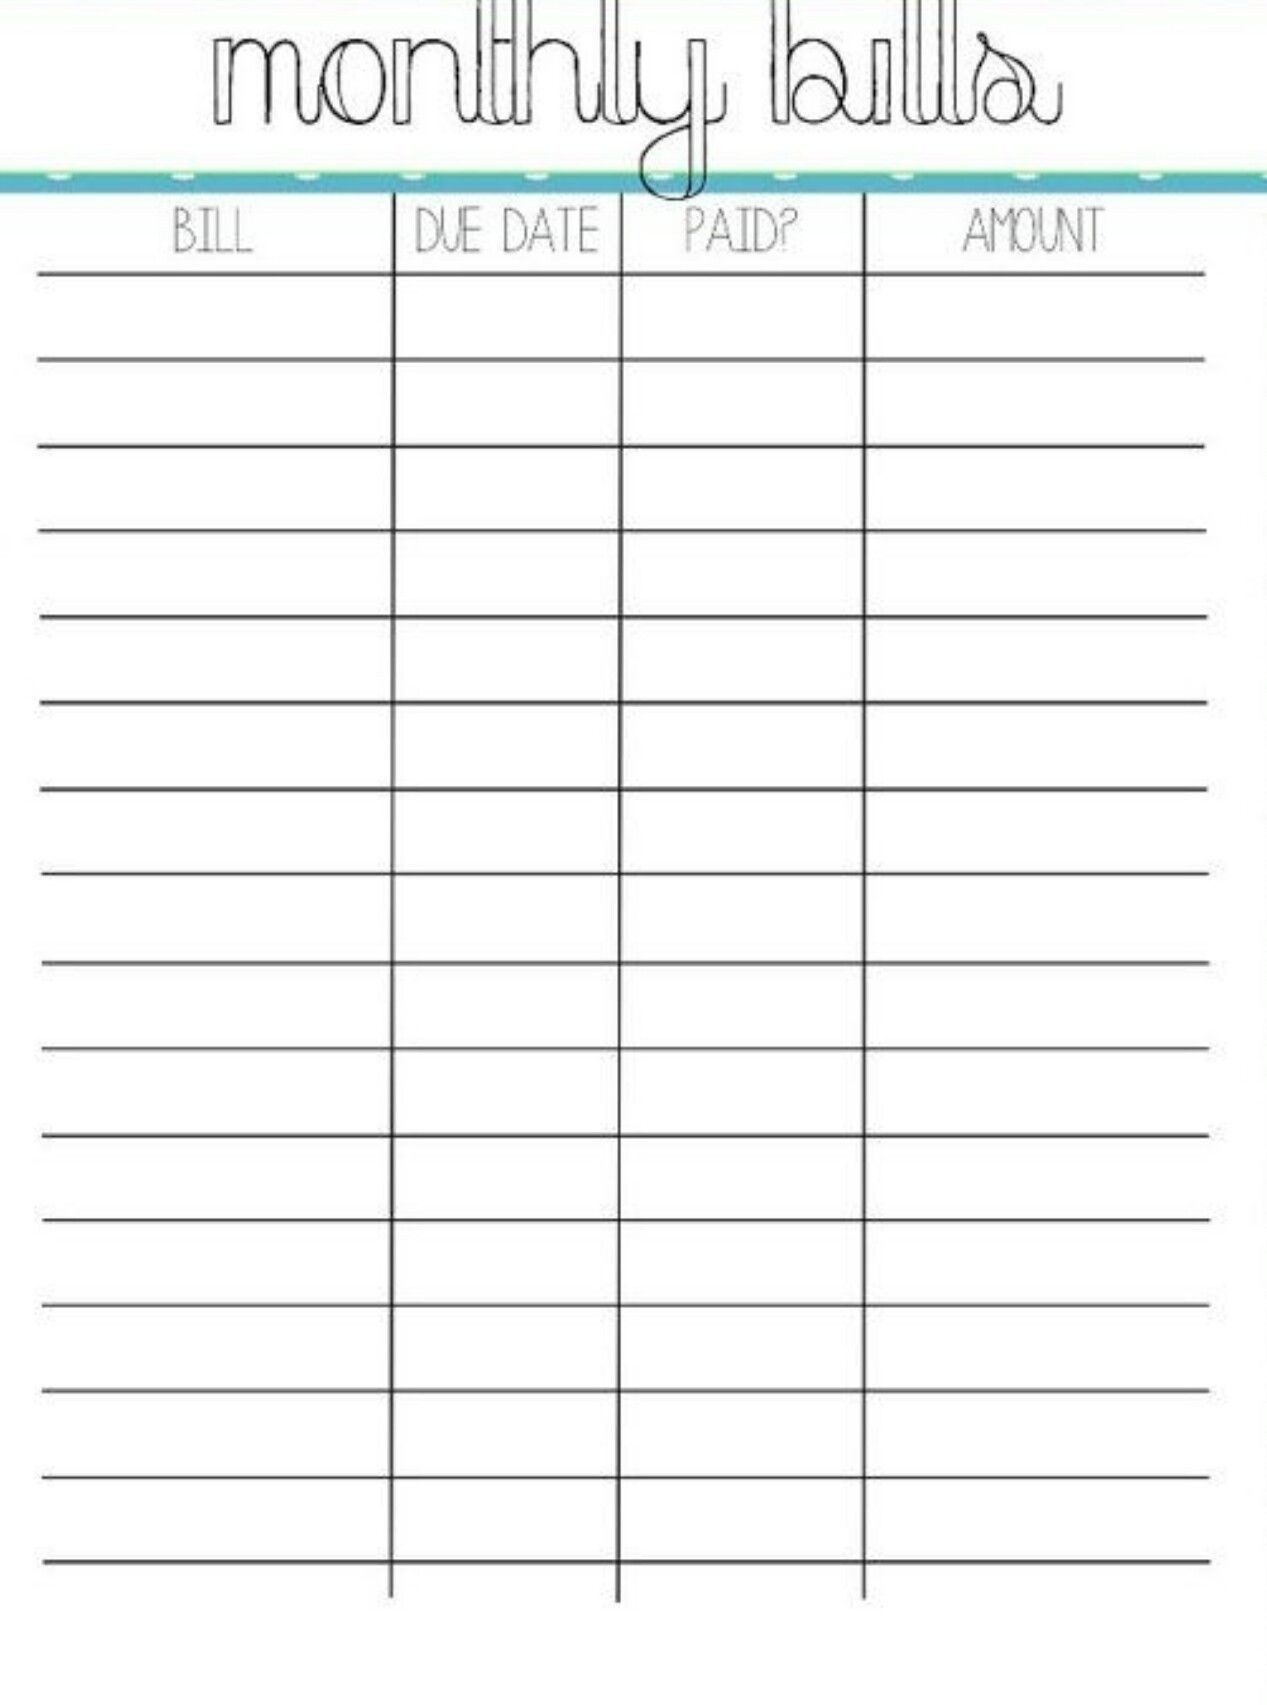 Pin By Crystal On Bills | Organizing Monthly Bills, Bill-Free Printable Bill Calendar Templates